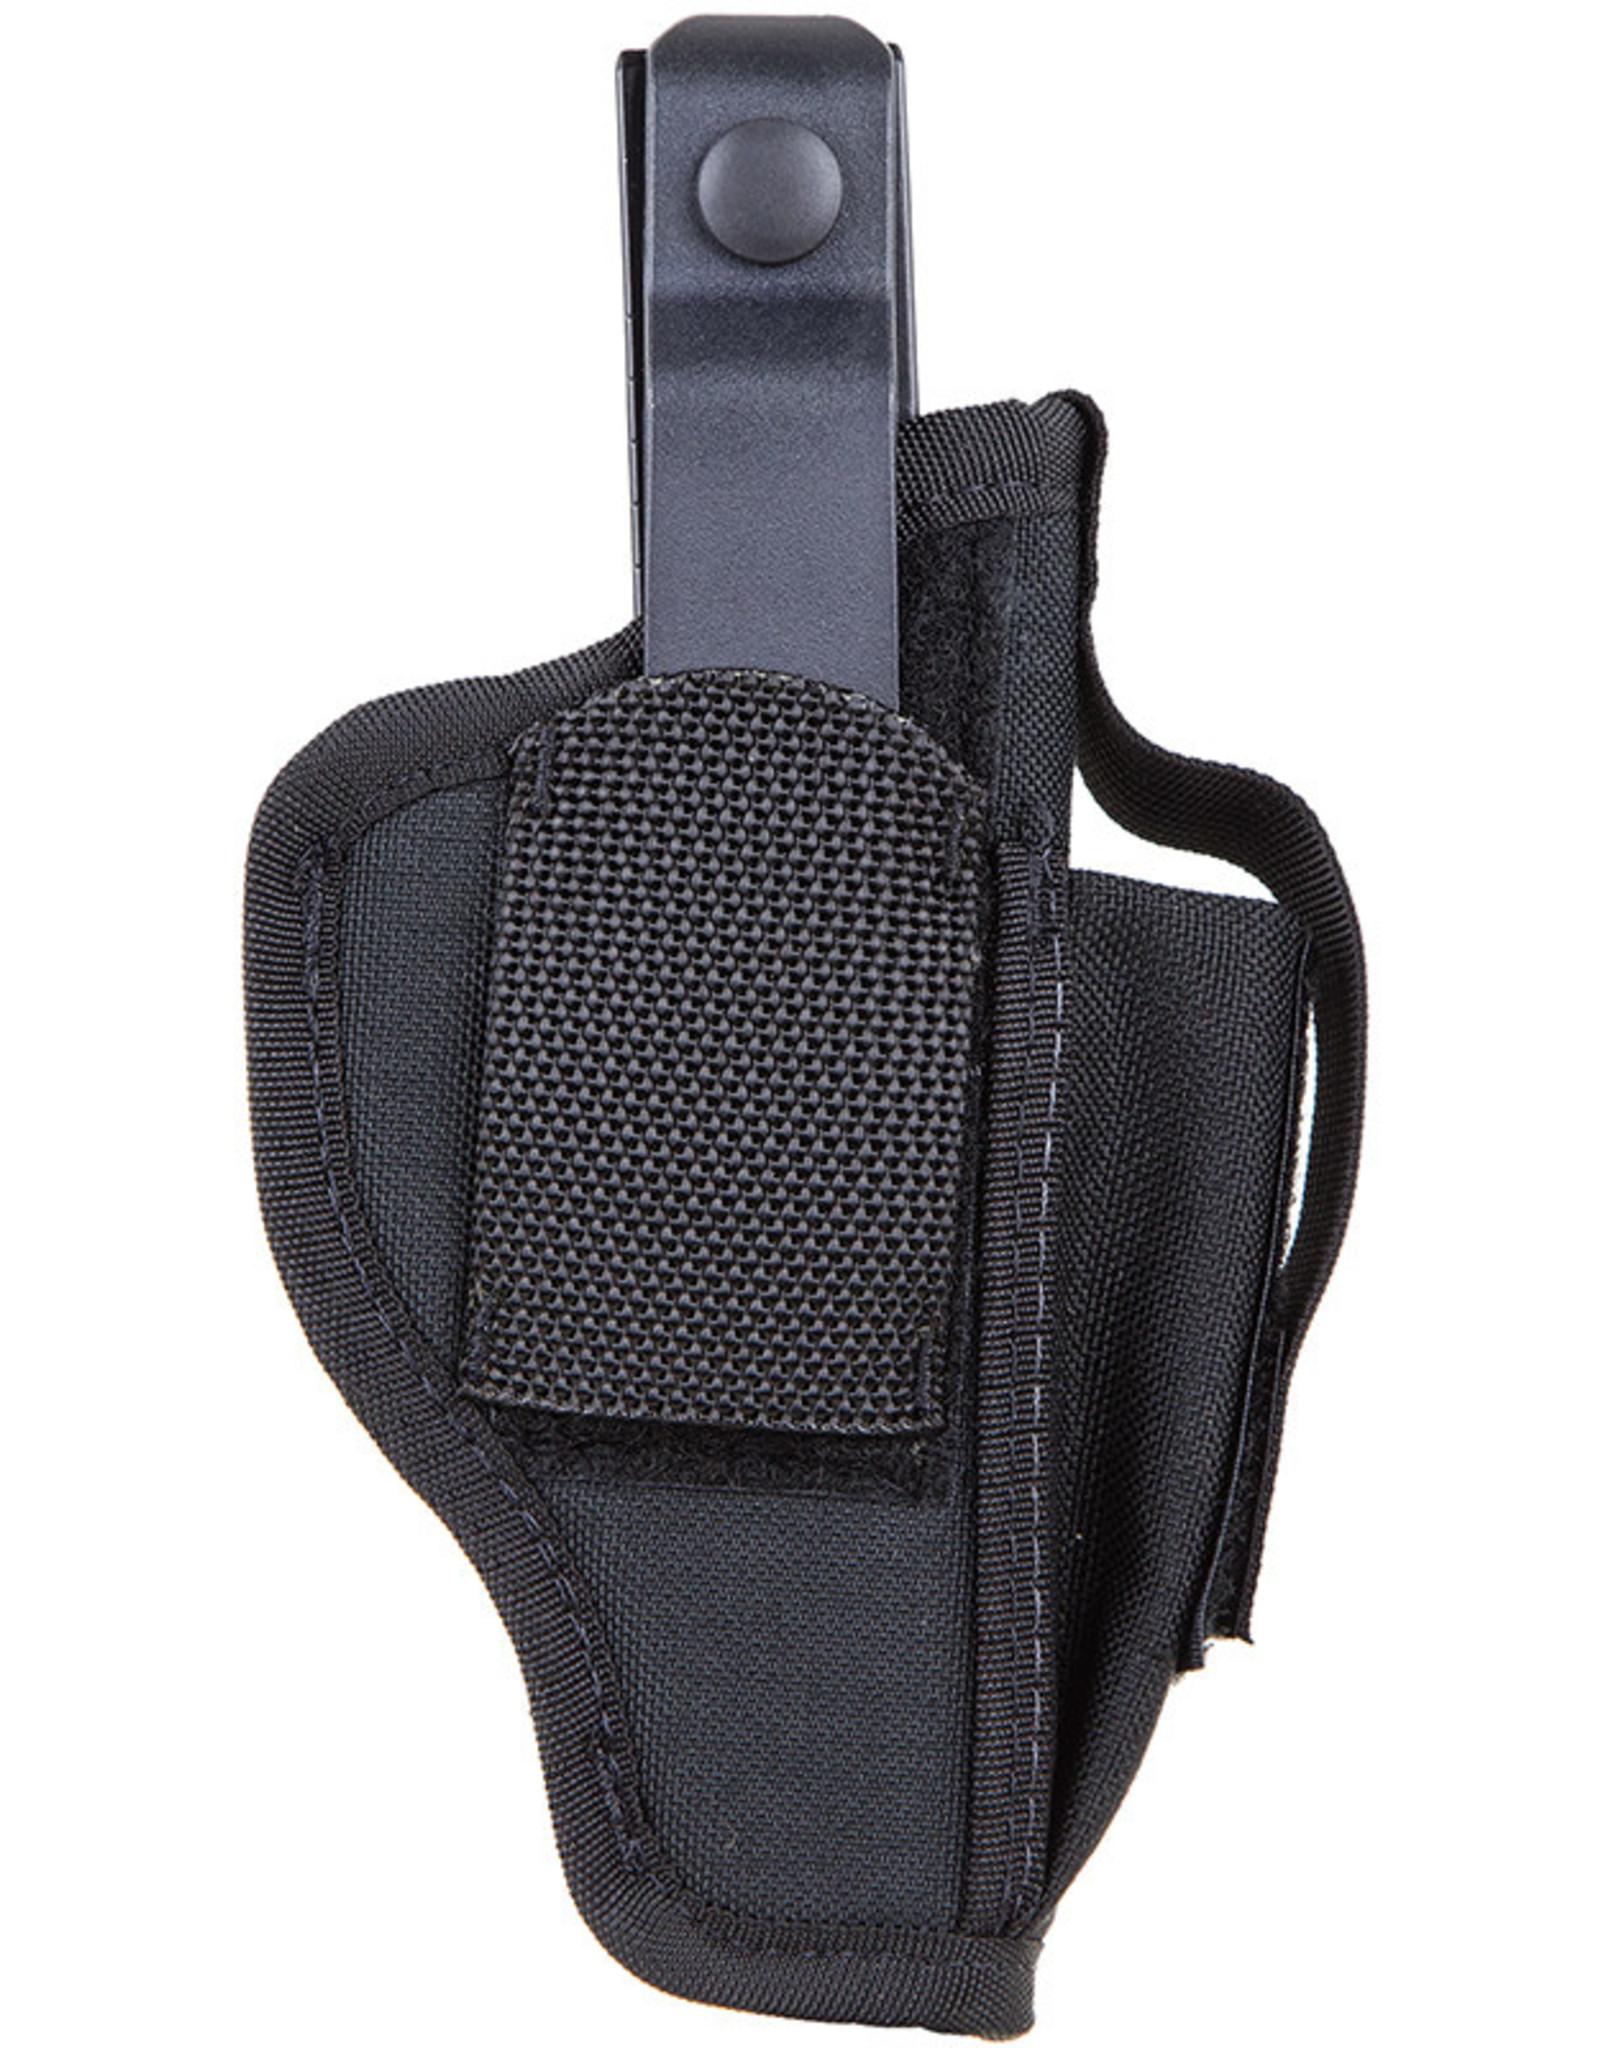 BLACK HAWK PRODUCTS Blackhawk Holster w/ Mag Pouch for Sm Frame 5 & 6 Rd Revolver w/Spur Nylon Black